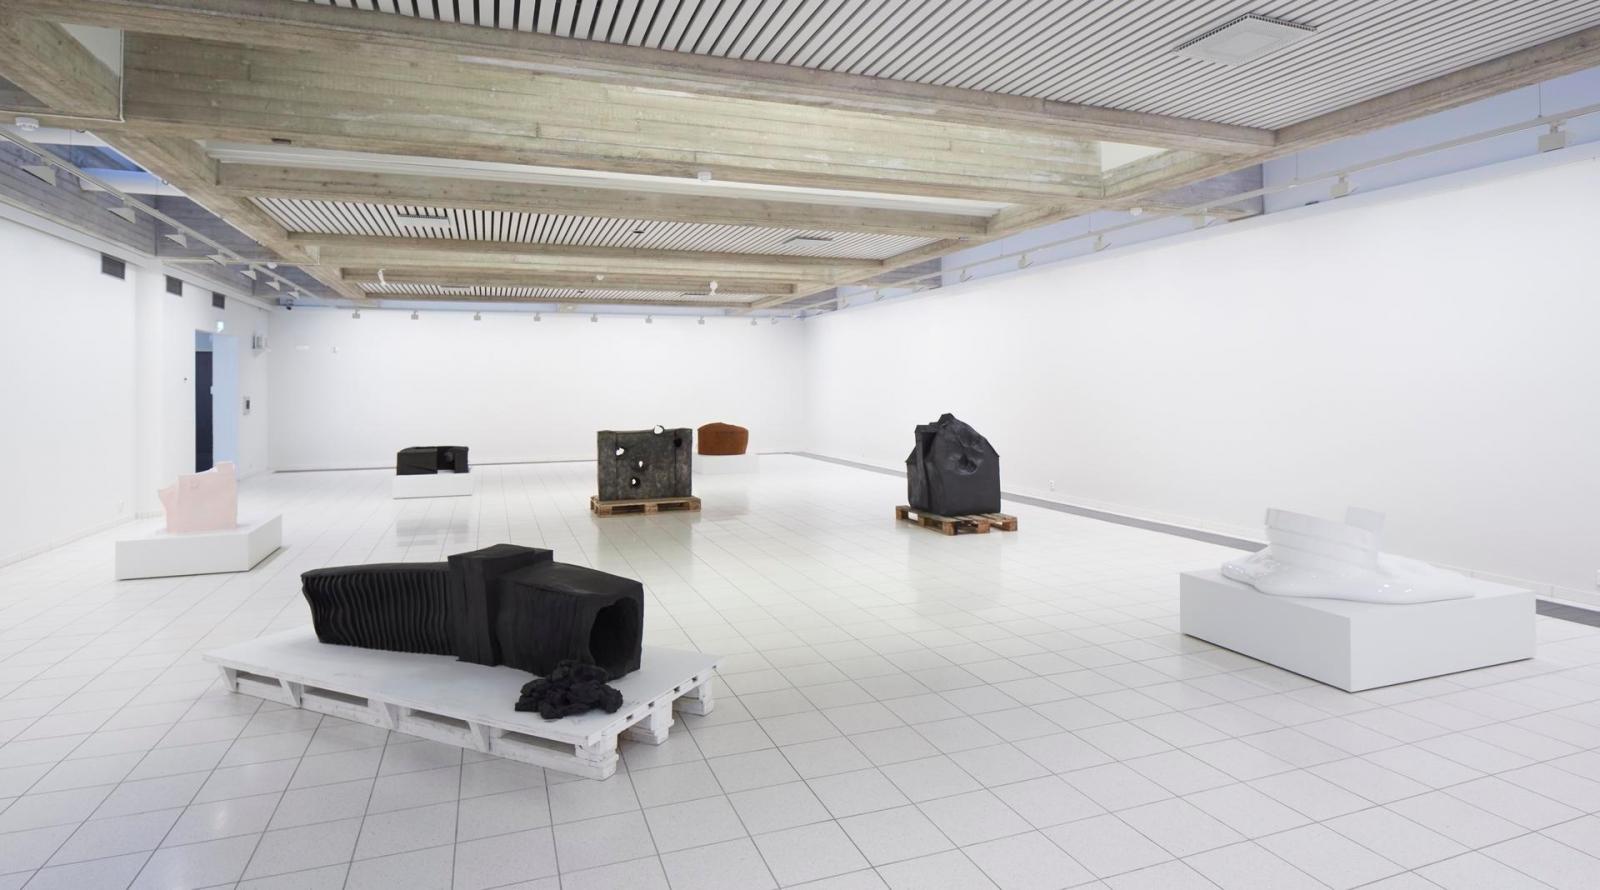 Erwin Wurm:Disruption